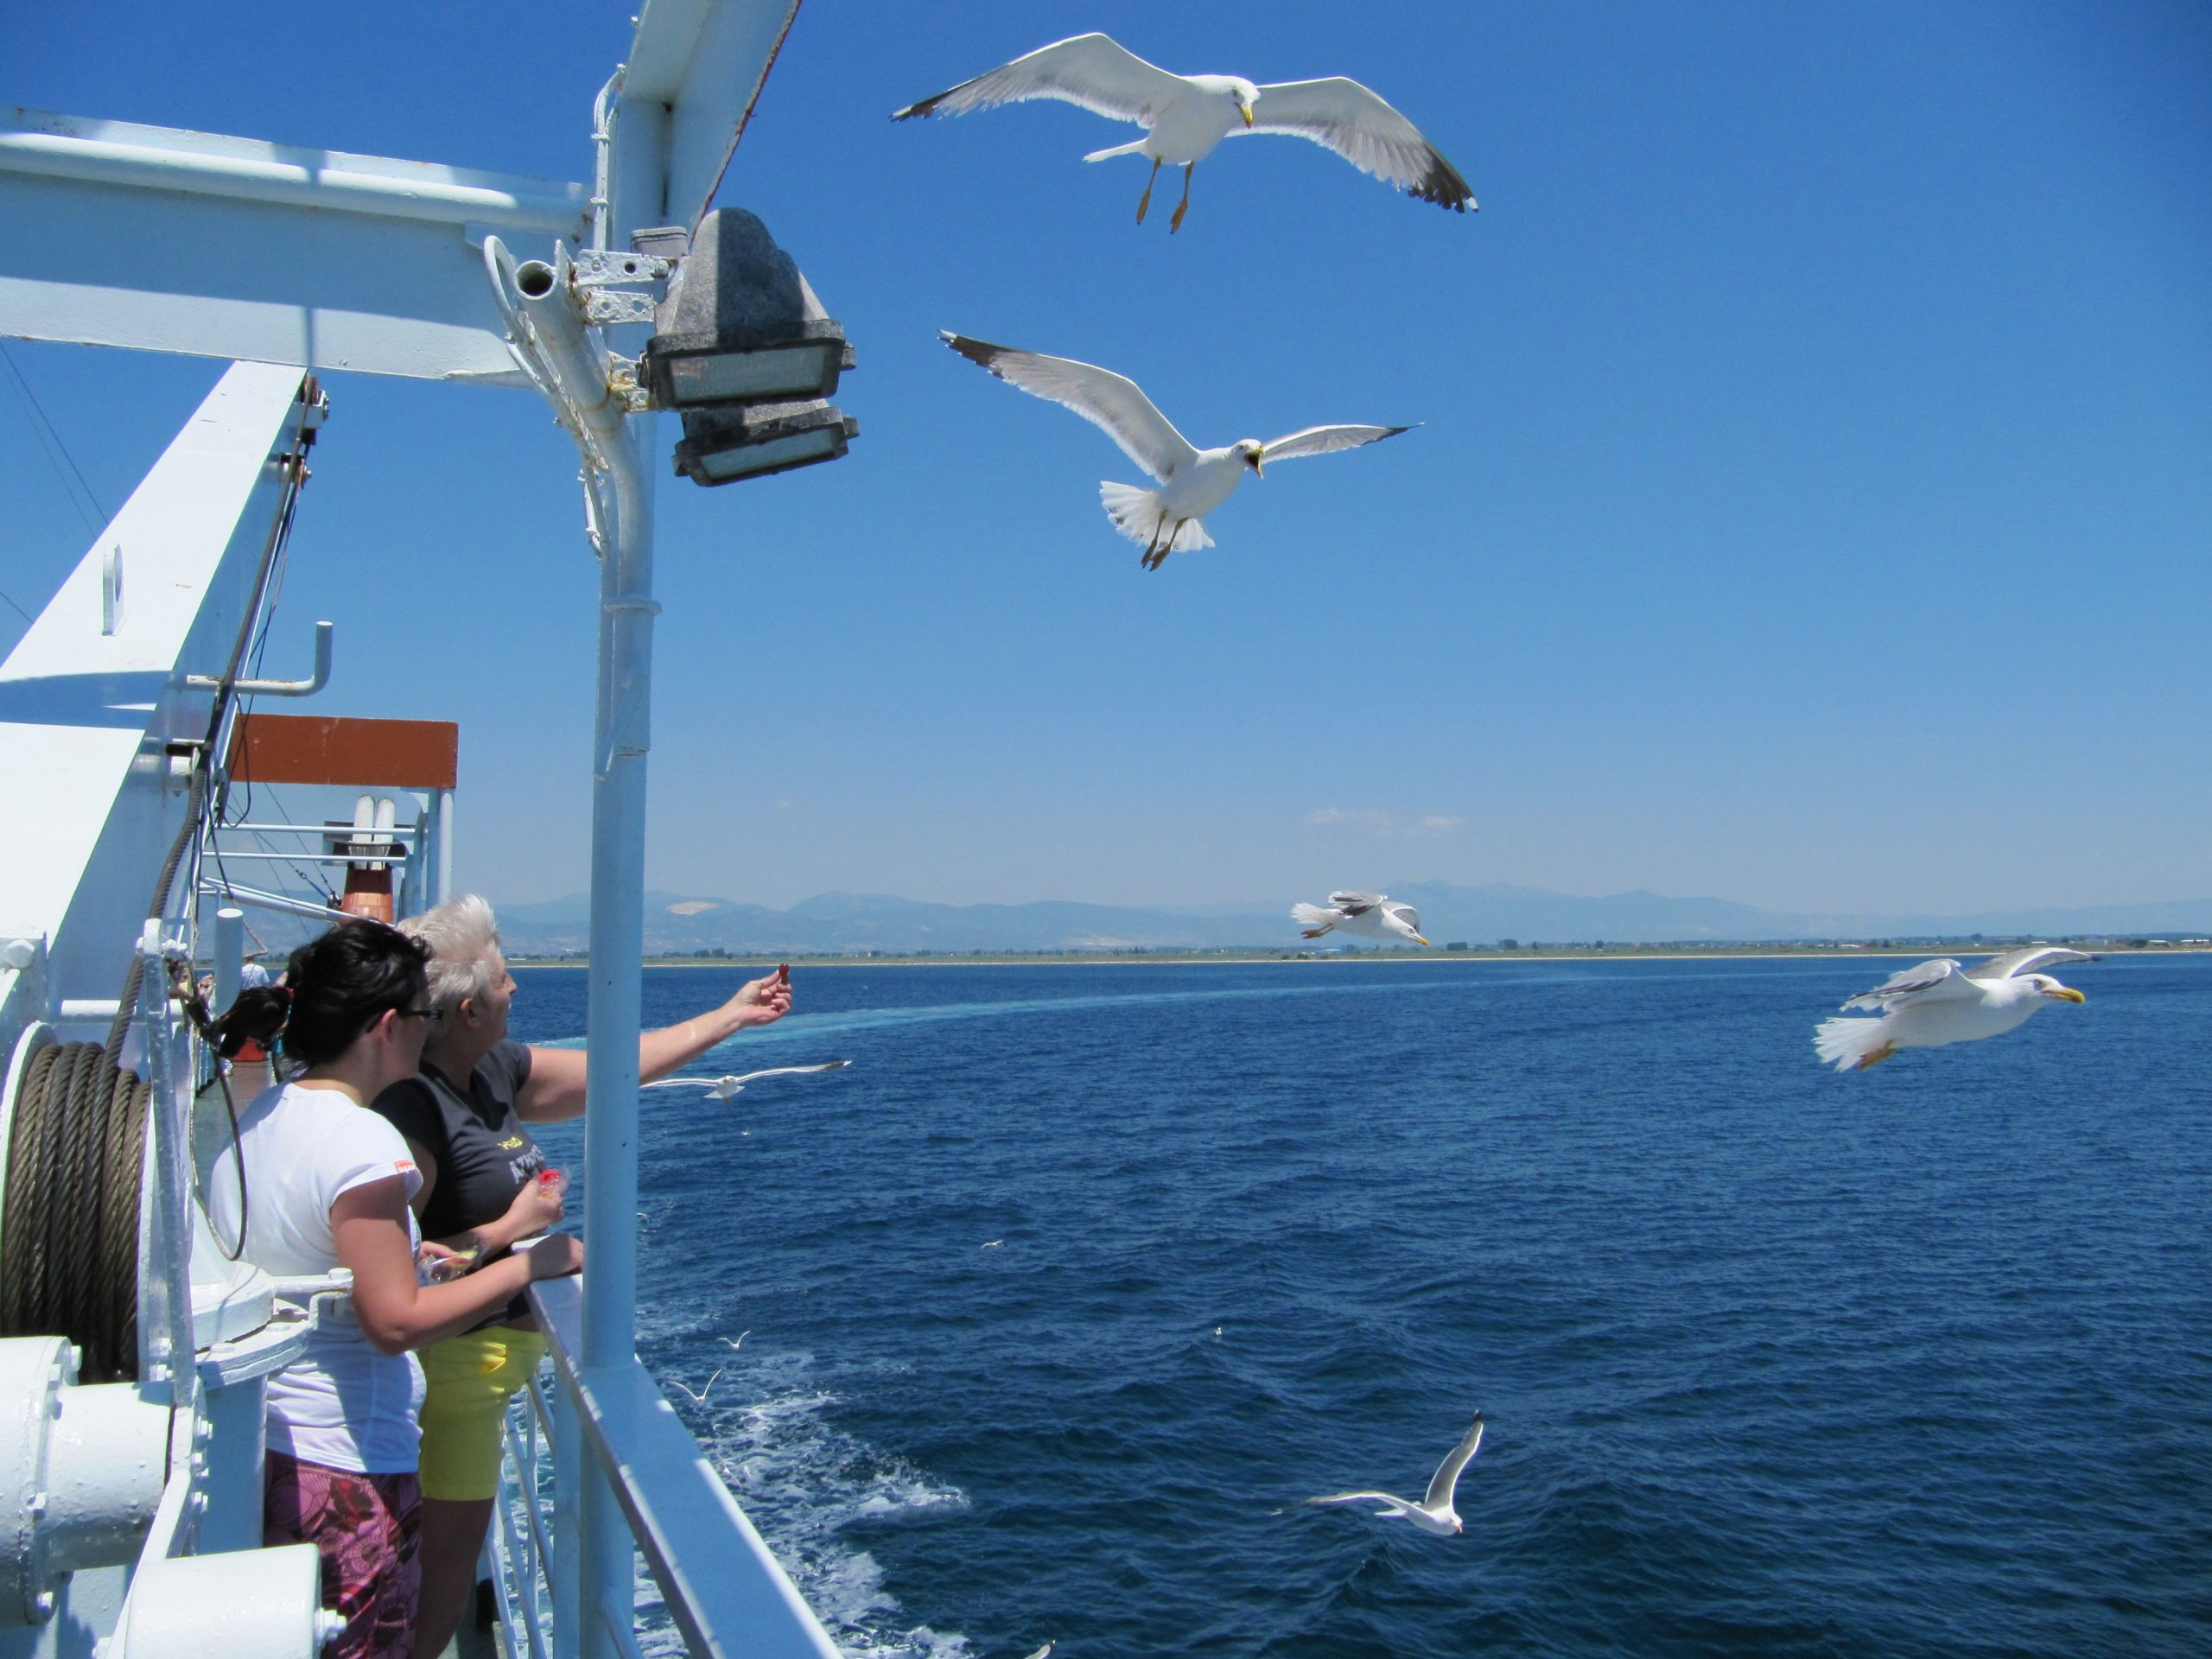 Pe ferry intre Kavala si Limenas - insula Thassos